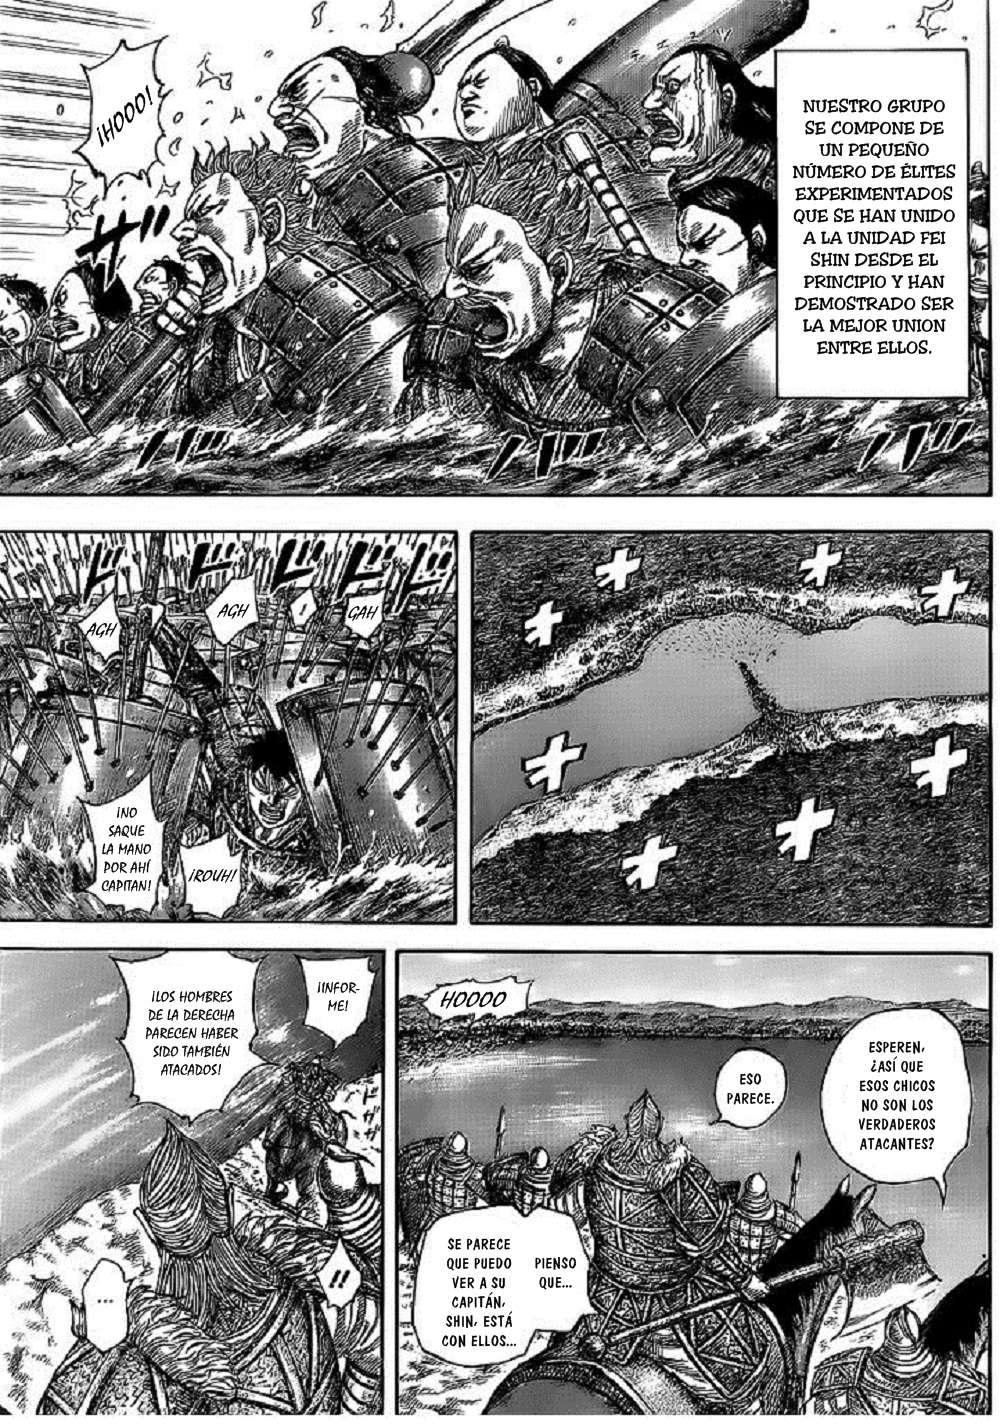 http://c5.ninemanga.com/es_manga/19/12307/431725/26c8ff85dd7610bd3855d7a63cc94971.jpg Page 10